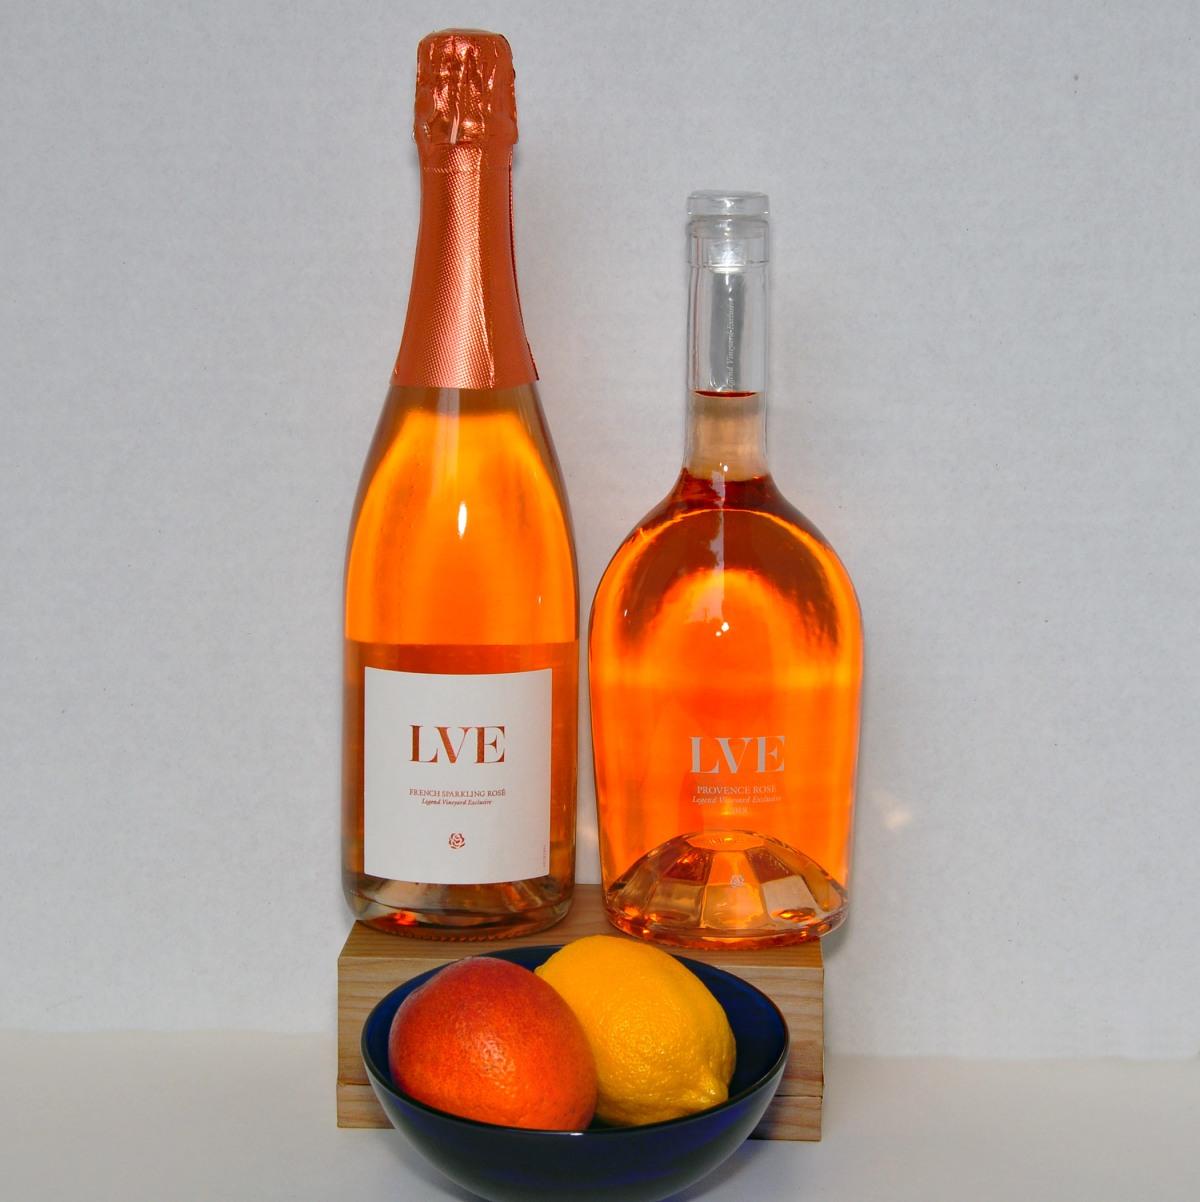 2. JCB wines LVE